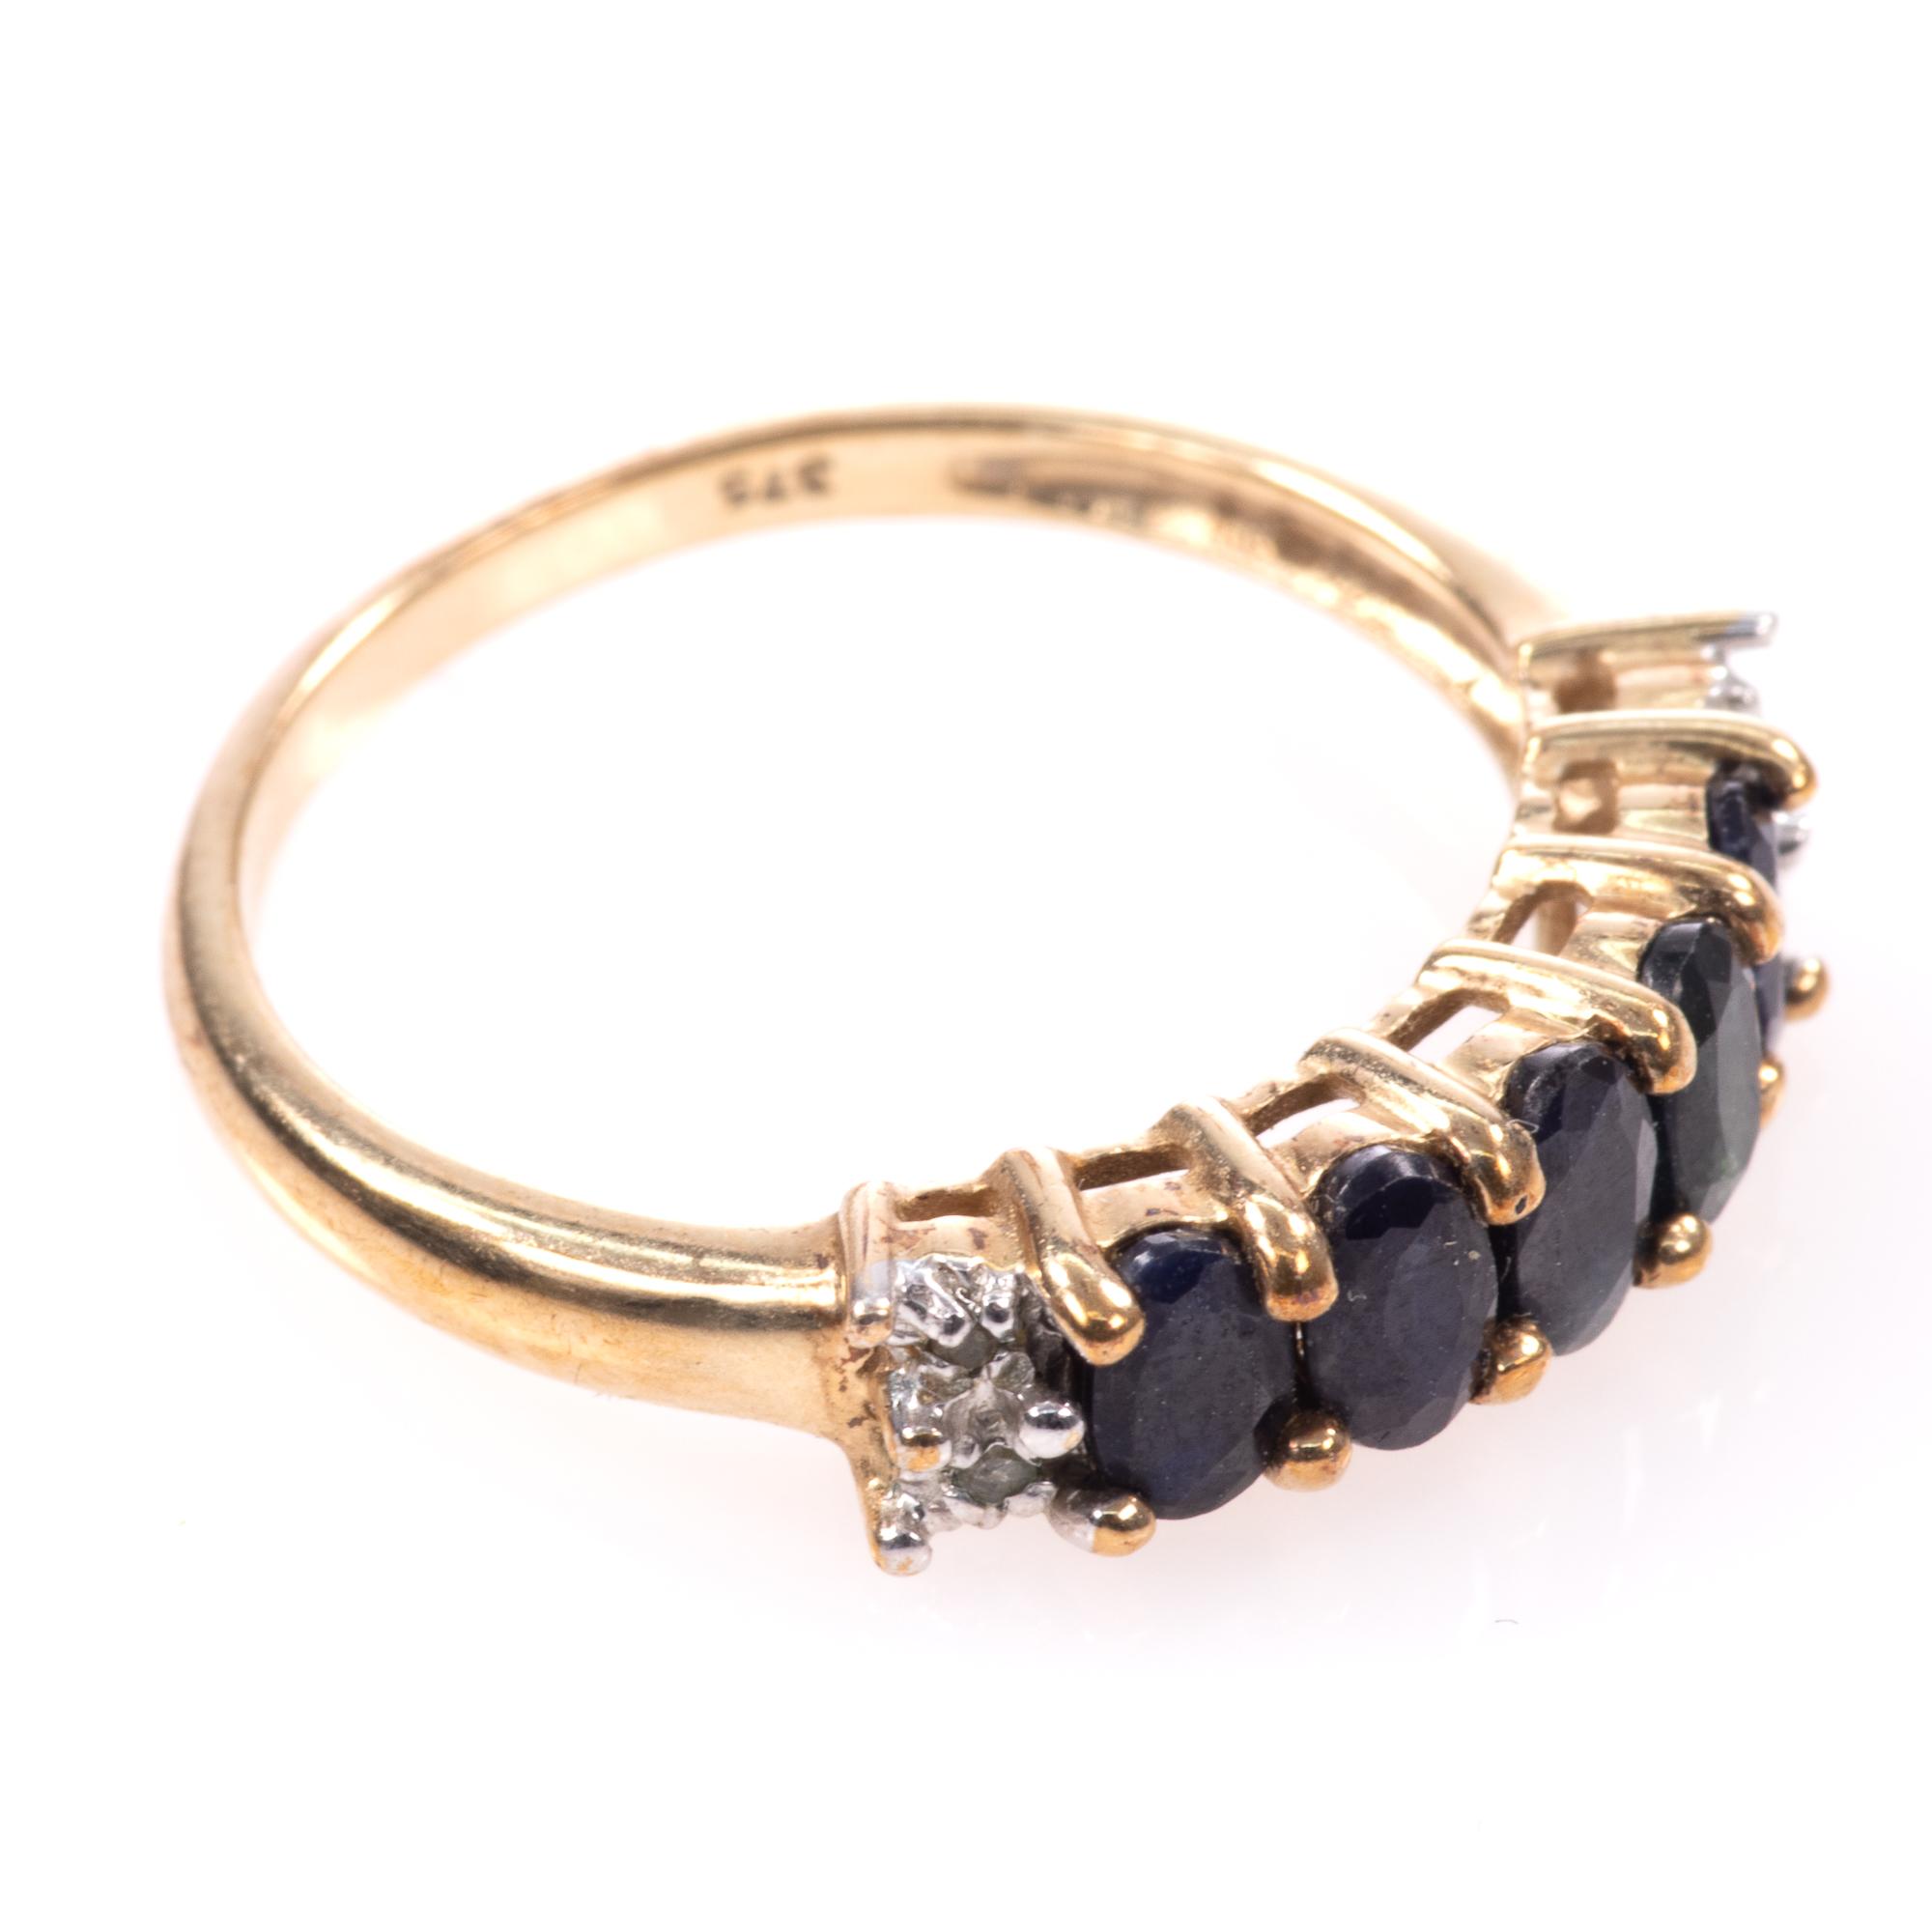 9ct Gold 5ct Sapphire & Diamond Ring - Image 6 of 7